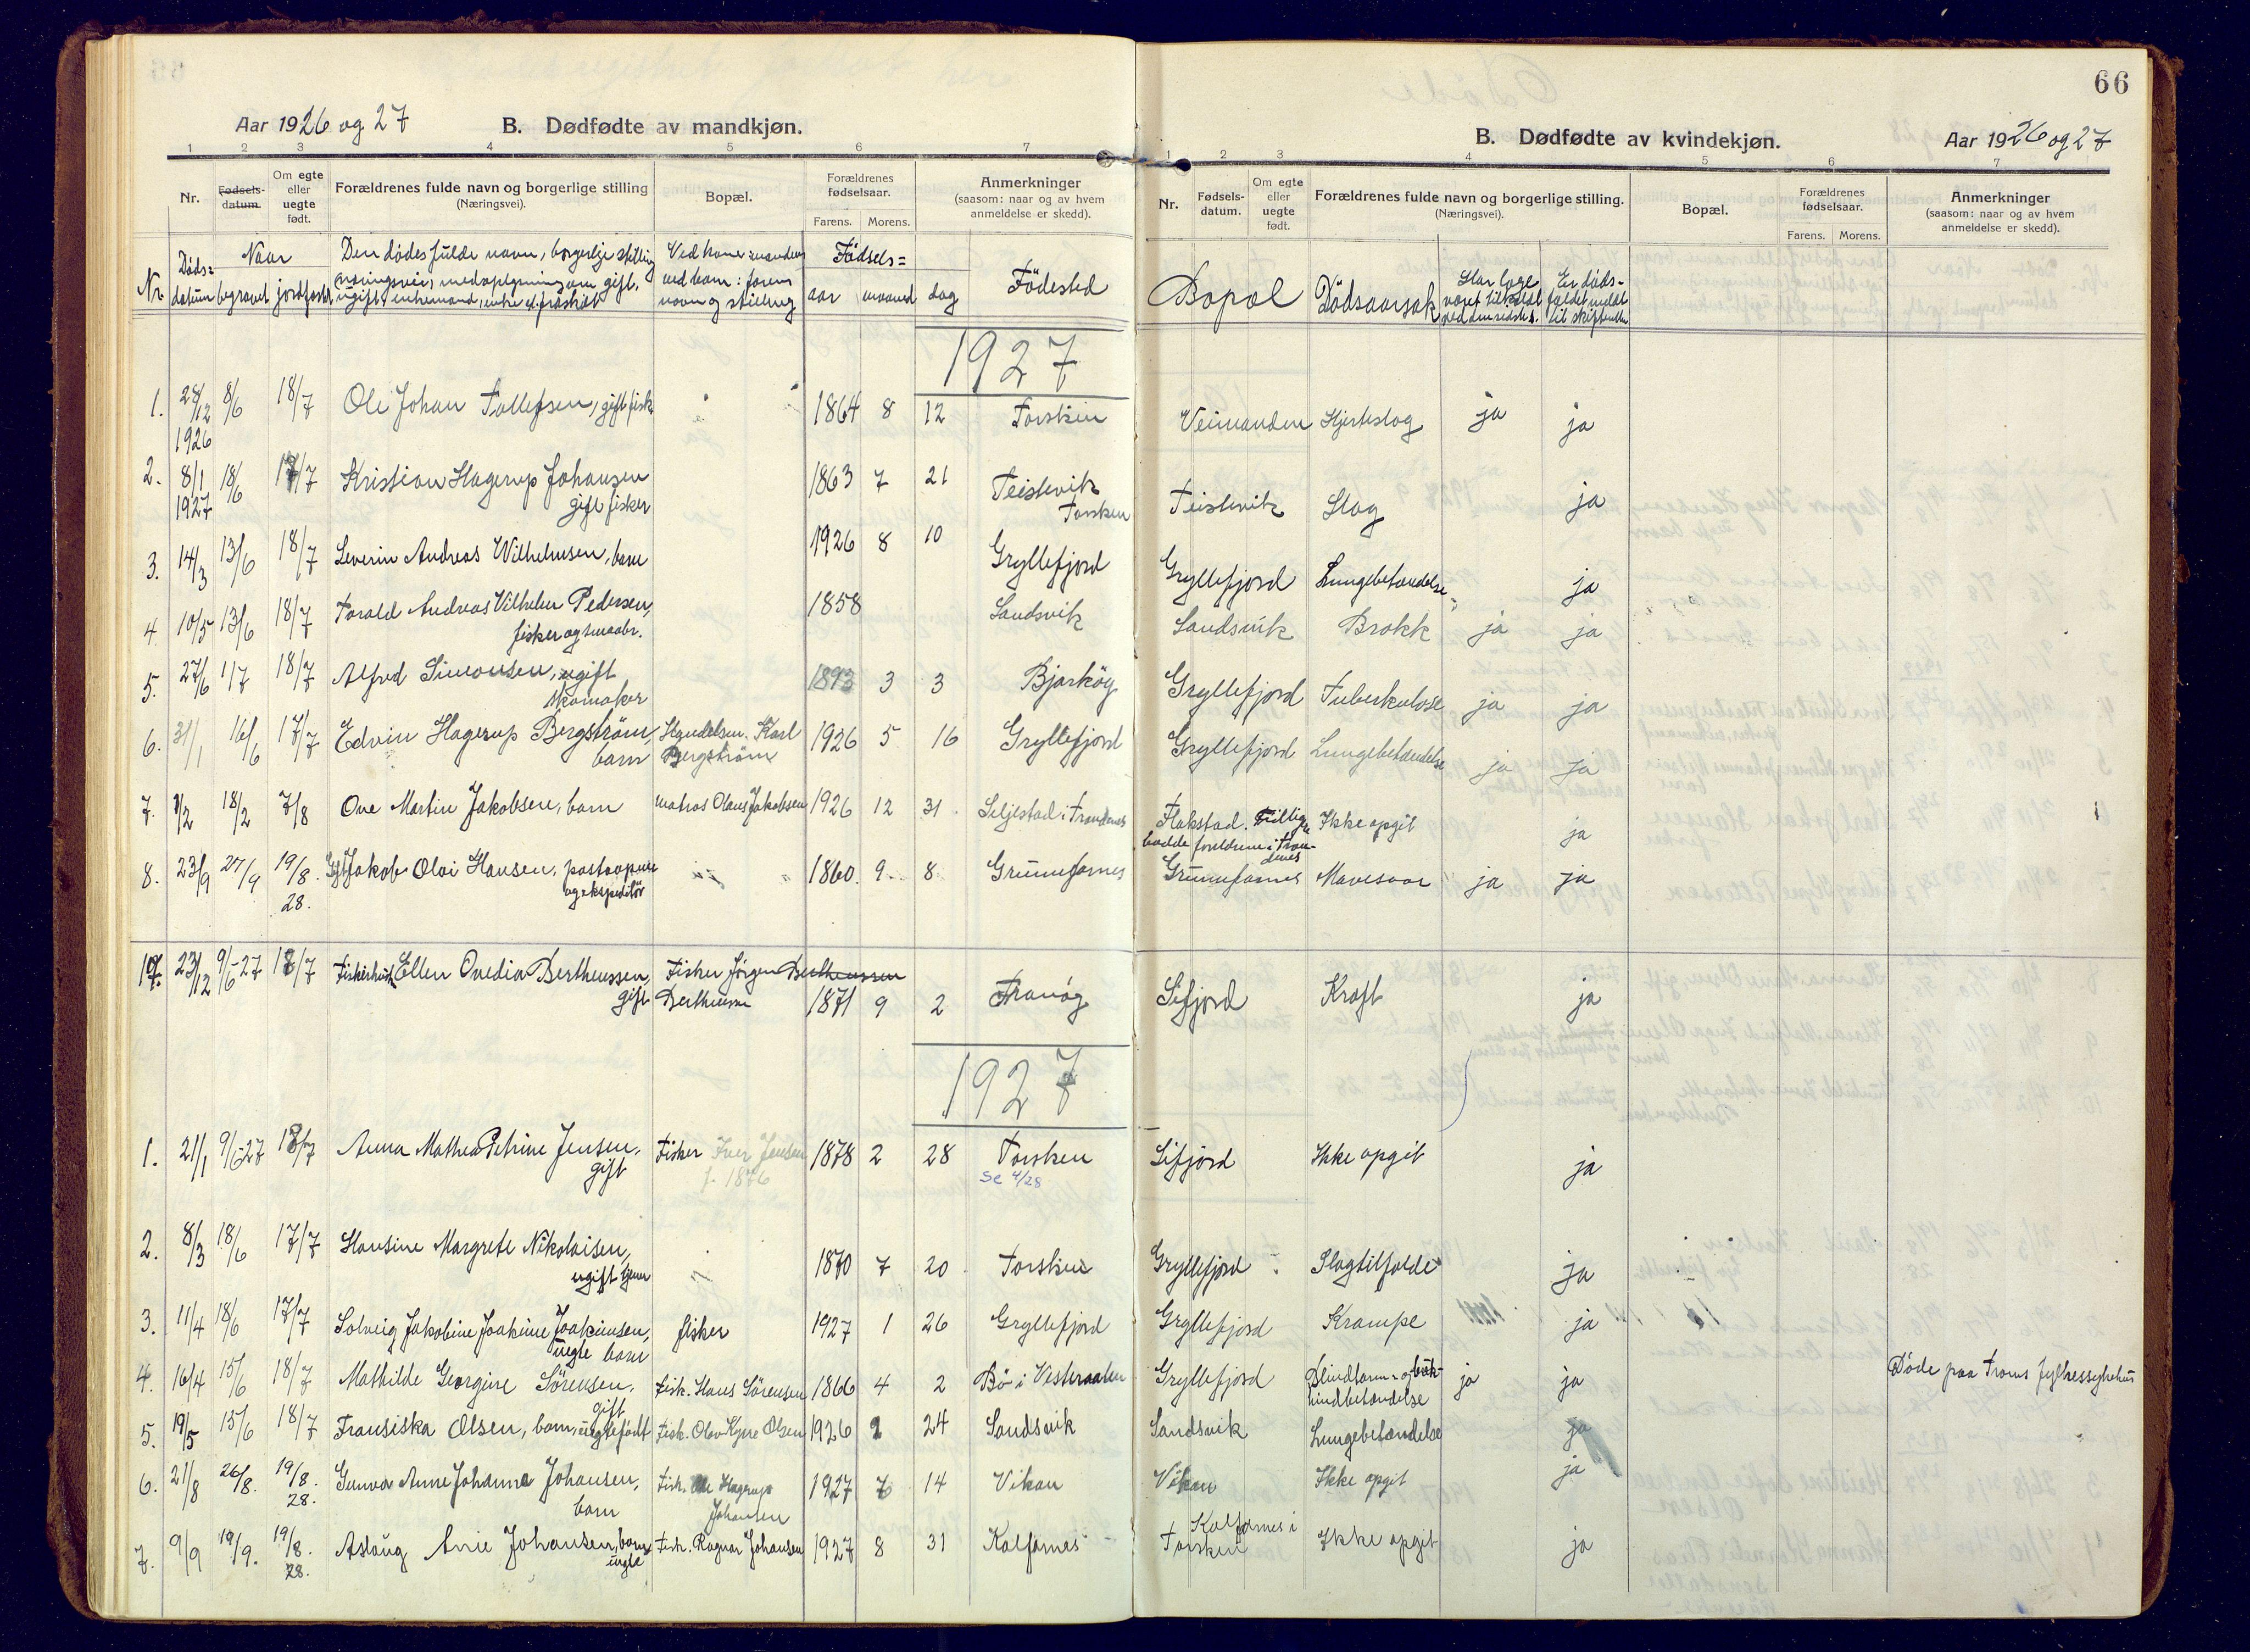 SATØ, Mefjord/Berg sokneprestkontor, G/Ga/Gaa: Ministerialbok nr. 10, 1916-1928, s. 66